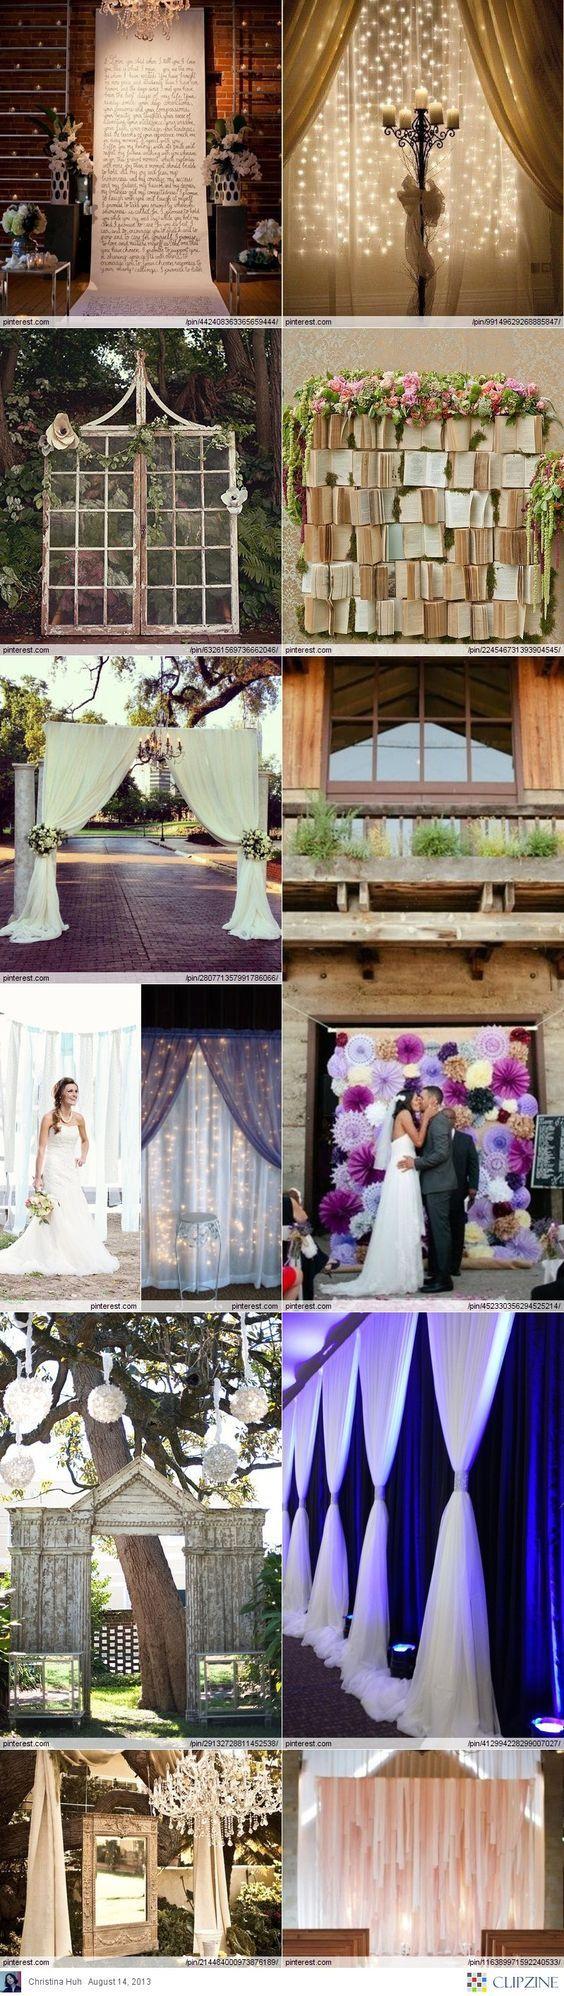 Wedding Backdrop DIY Ideas ***A Book backdrop, how sweet is that???: